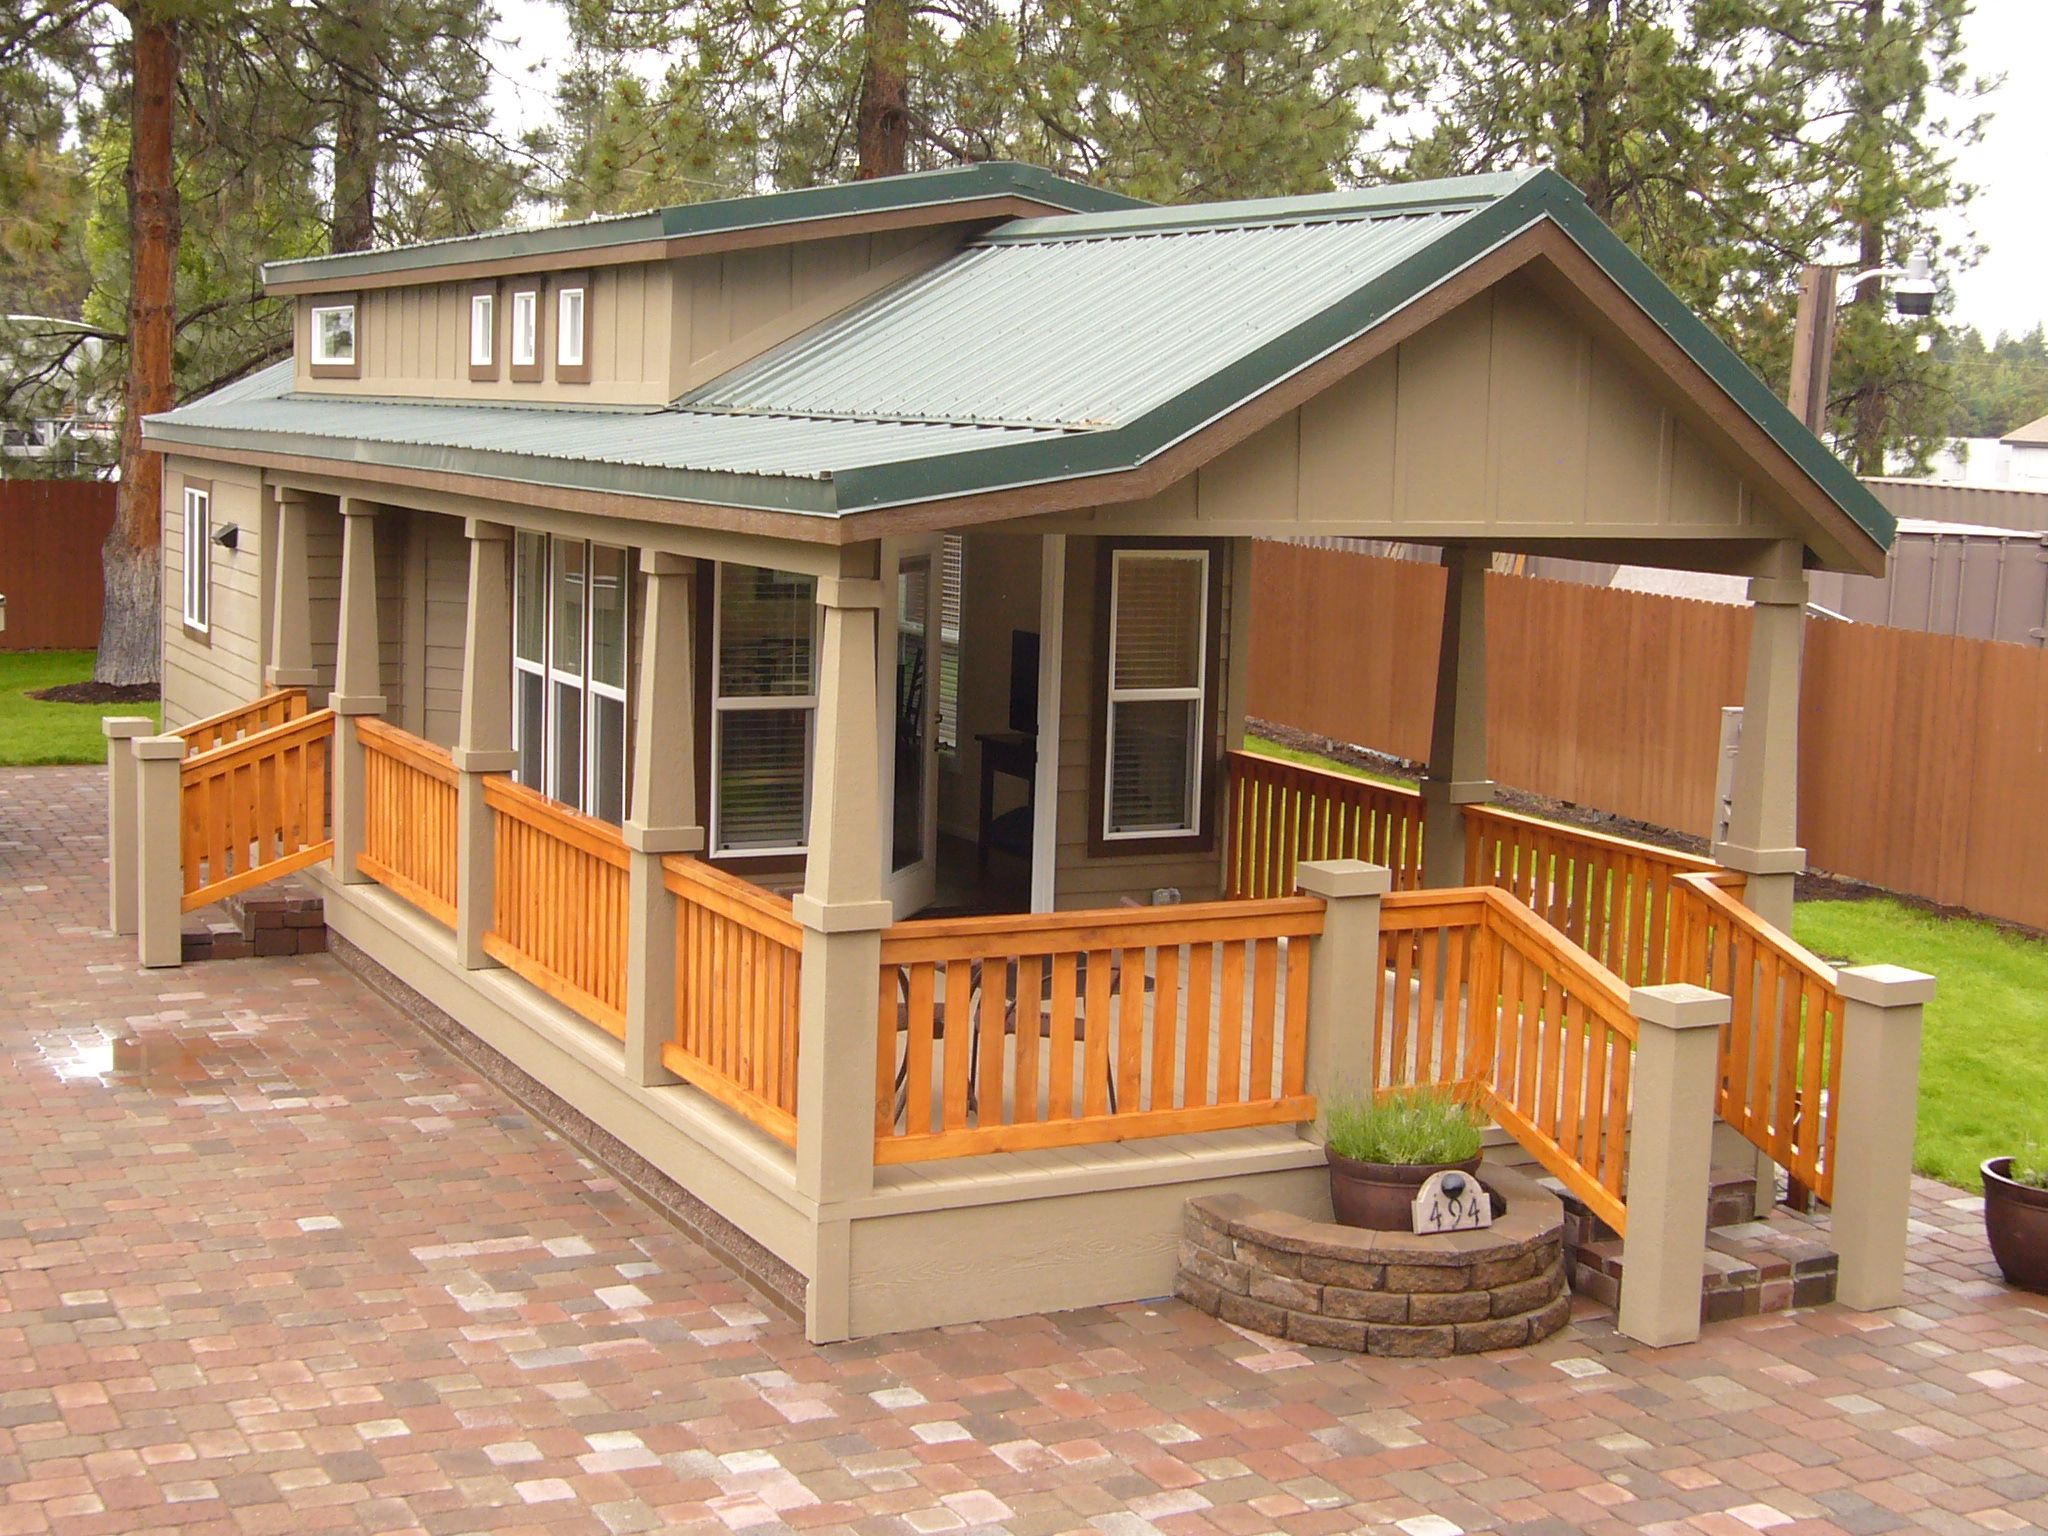 Luxury Mobile Homes for Sale Bing images Park model